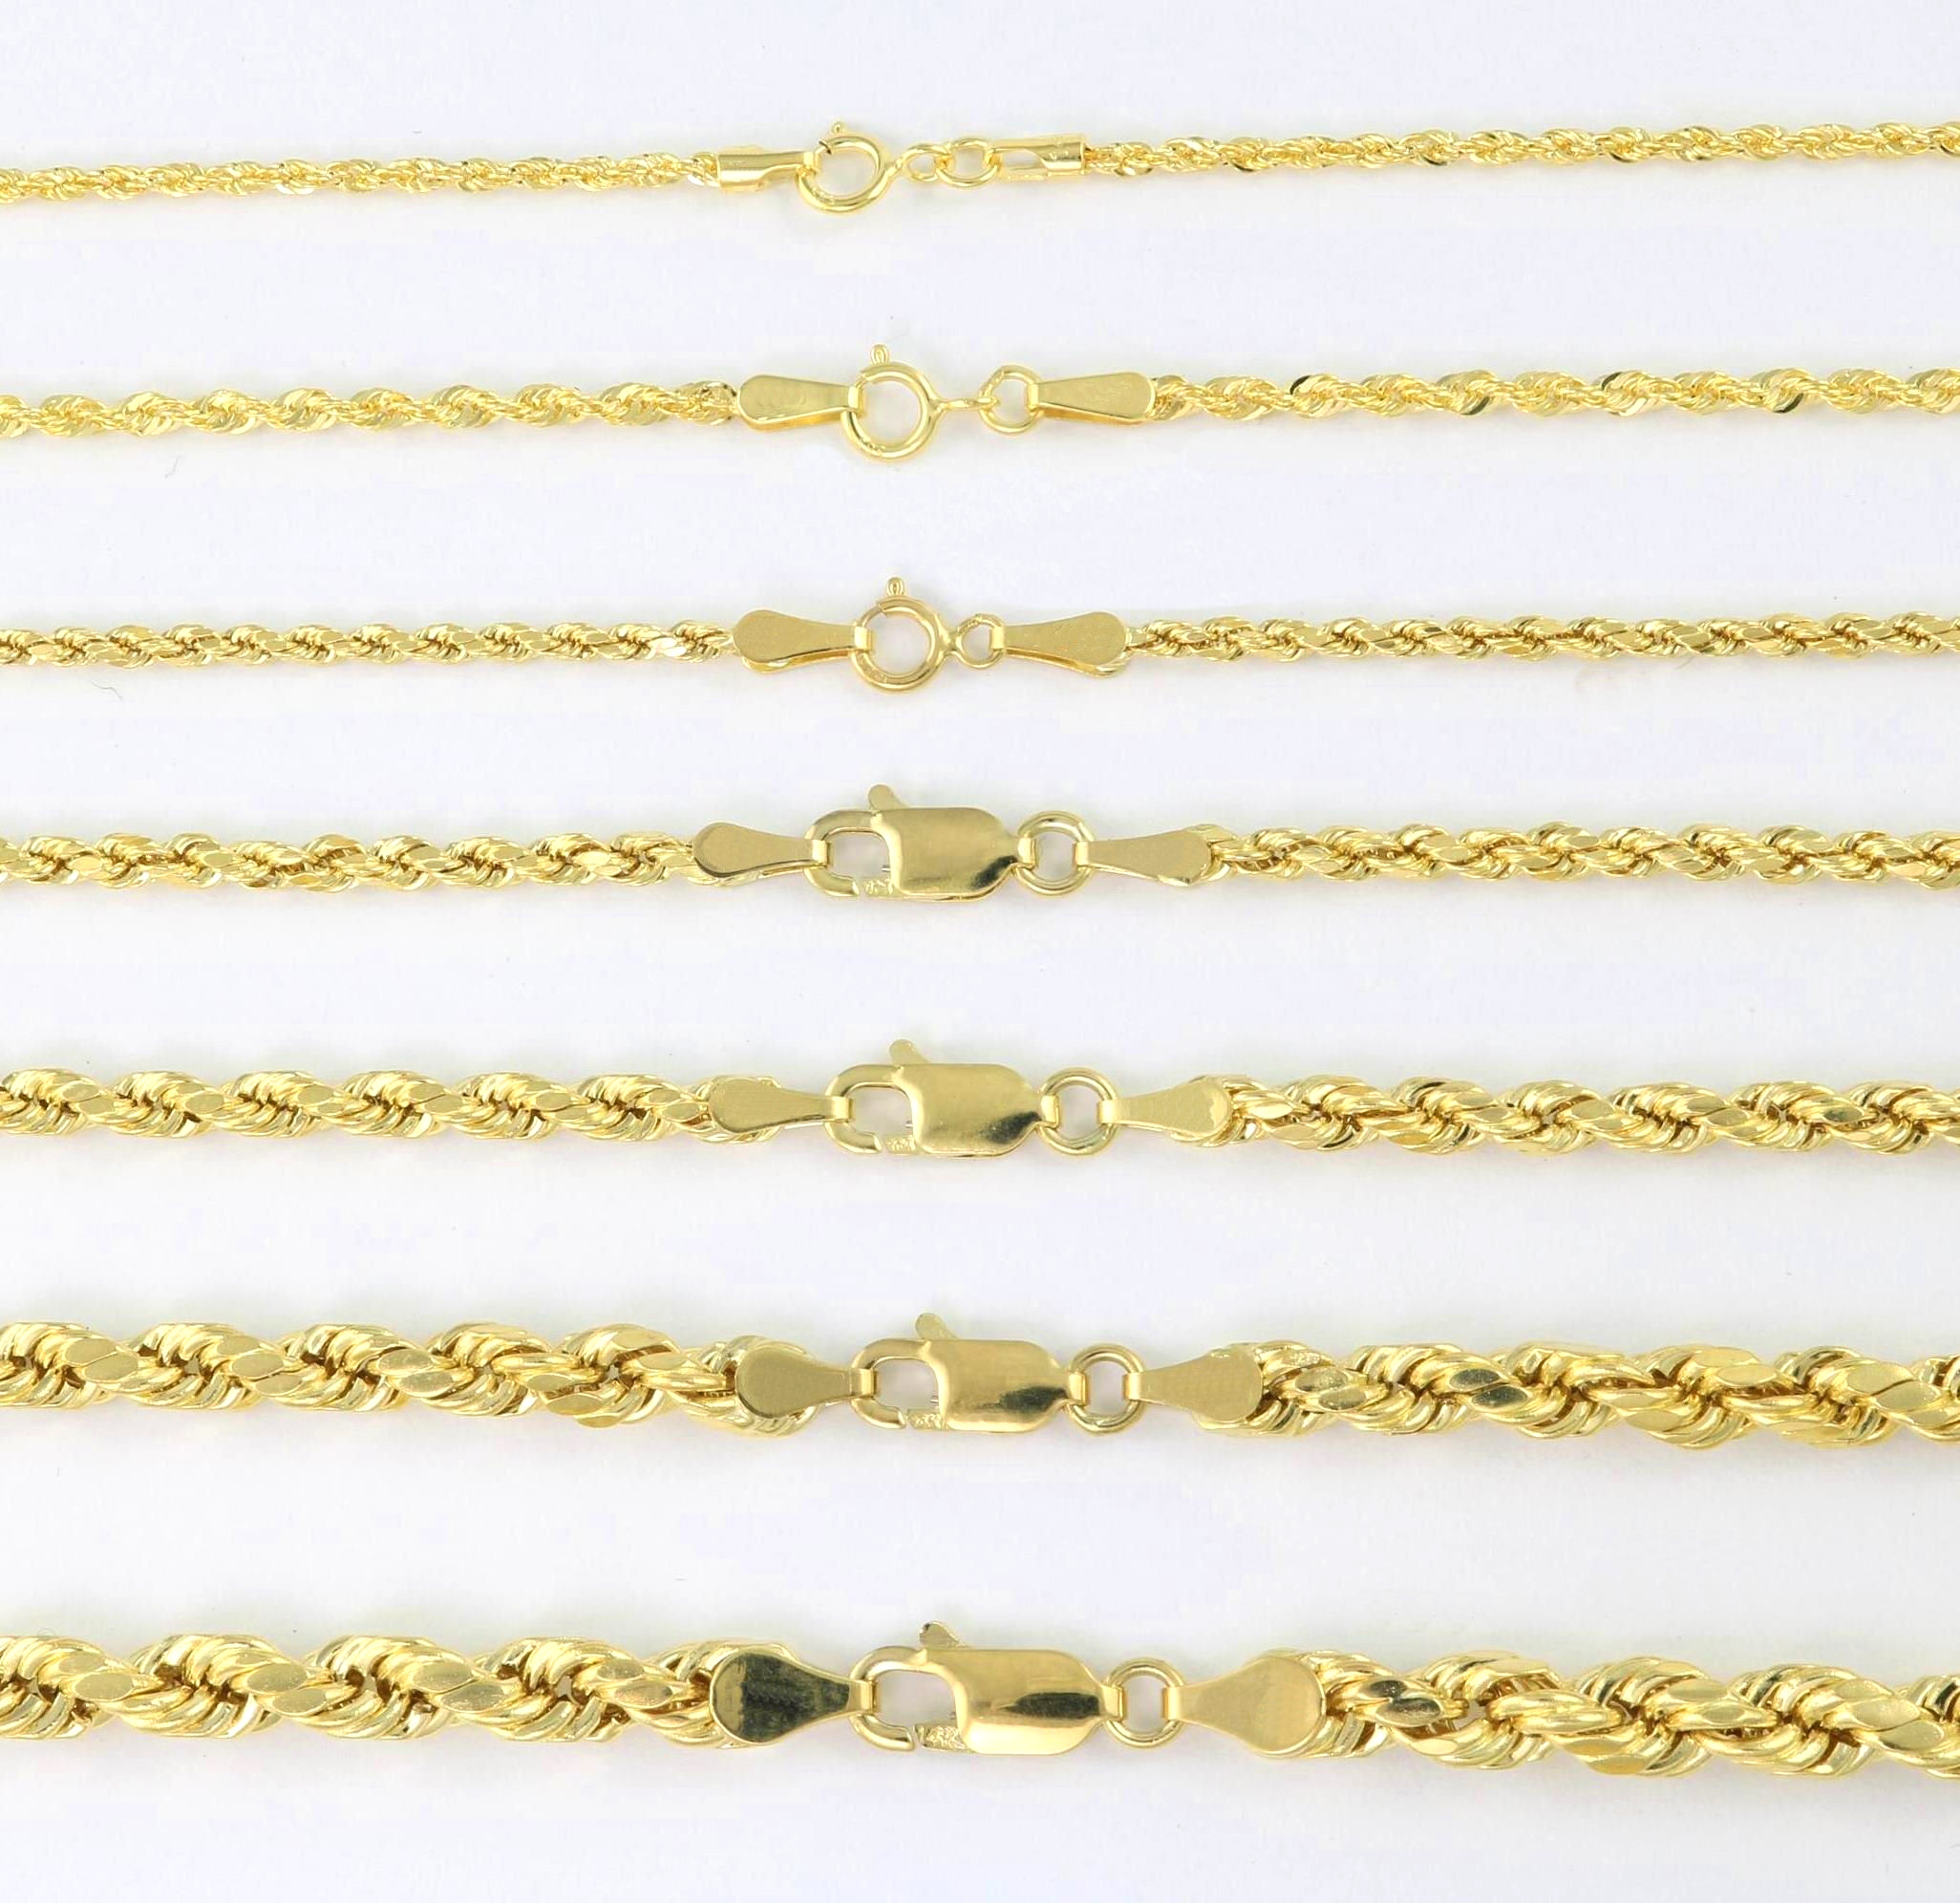 "10K Yellow Gold Light 1.5mm-4mm Diamond Cut Rope Chain Pendant Necklace 14""- 30"" 2"